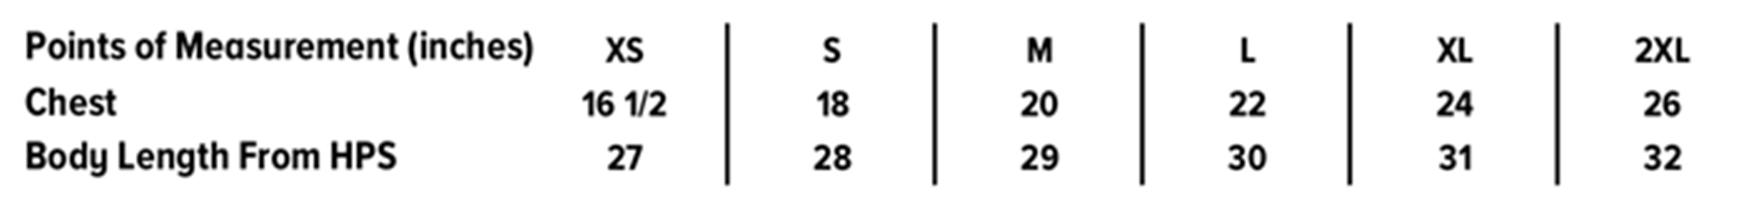 shirt-measurements3-1579204615-777.jpg